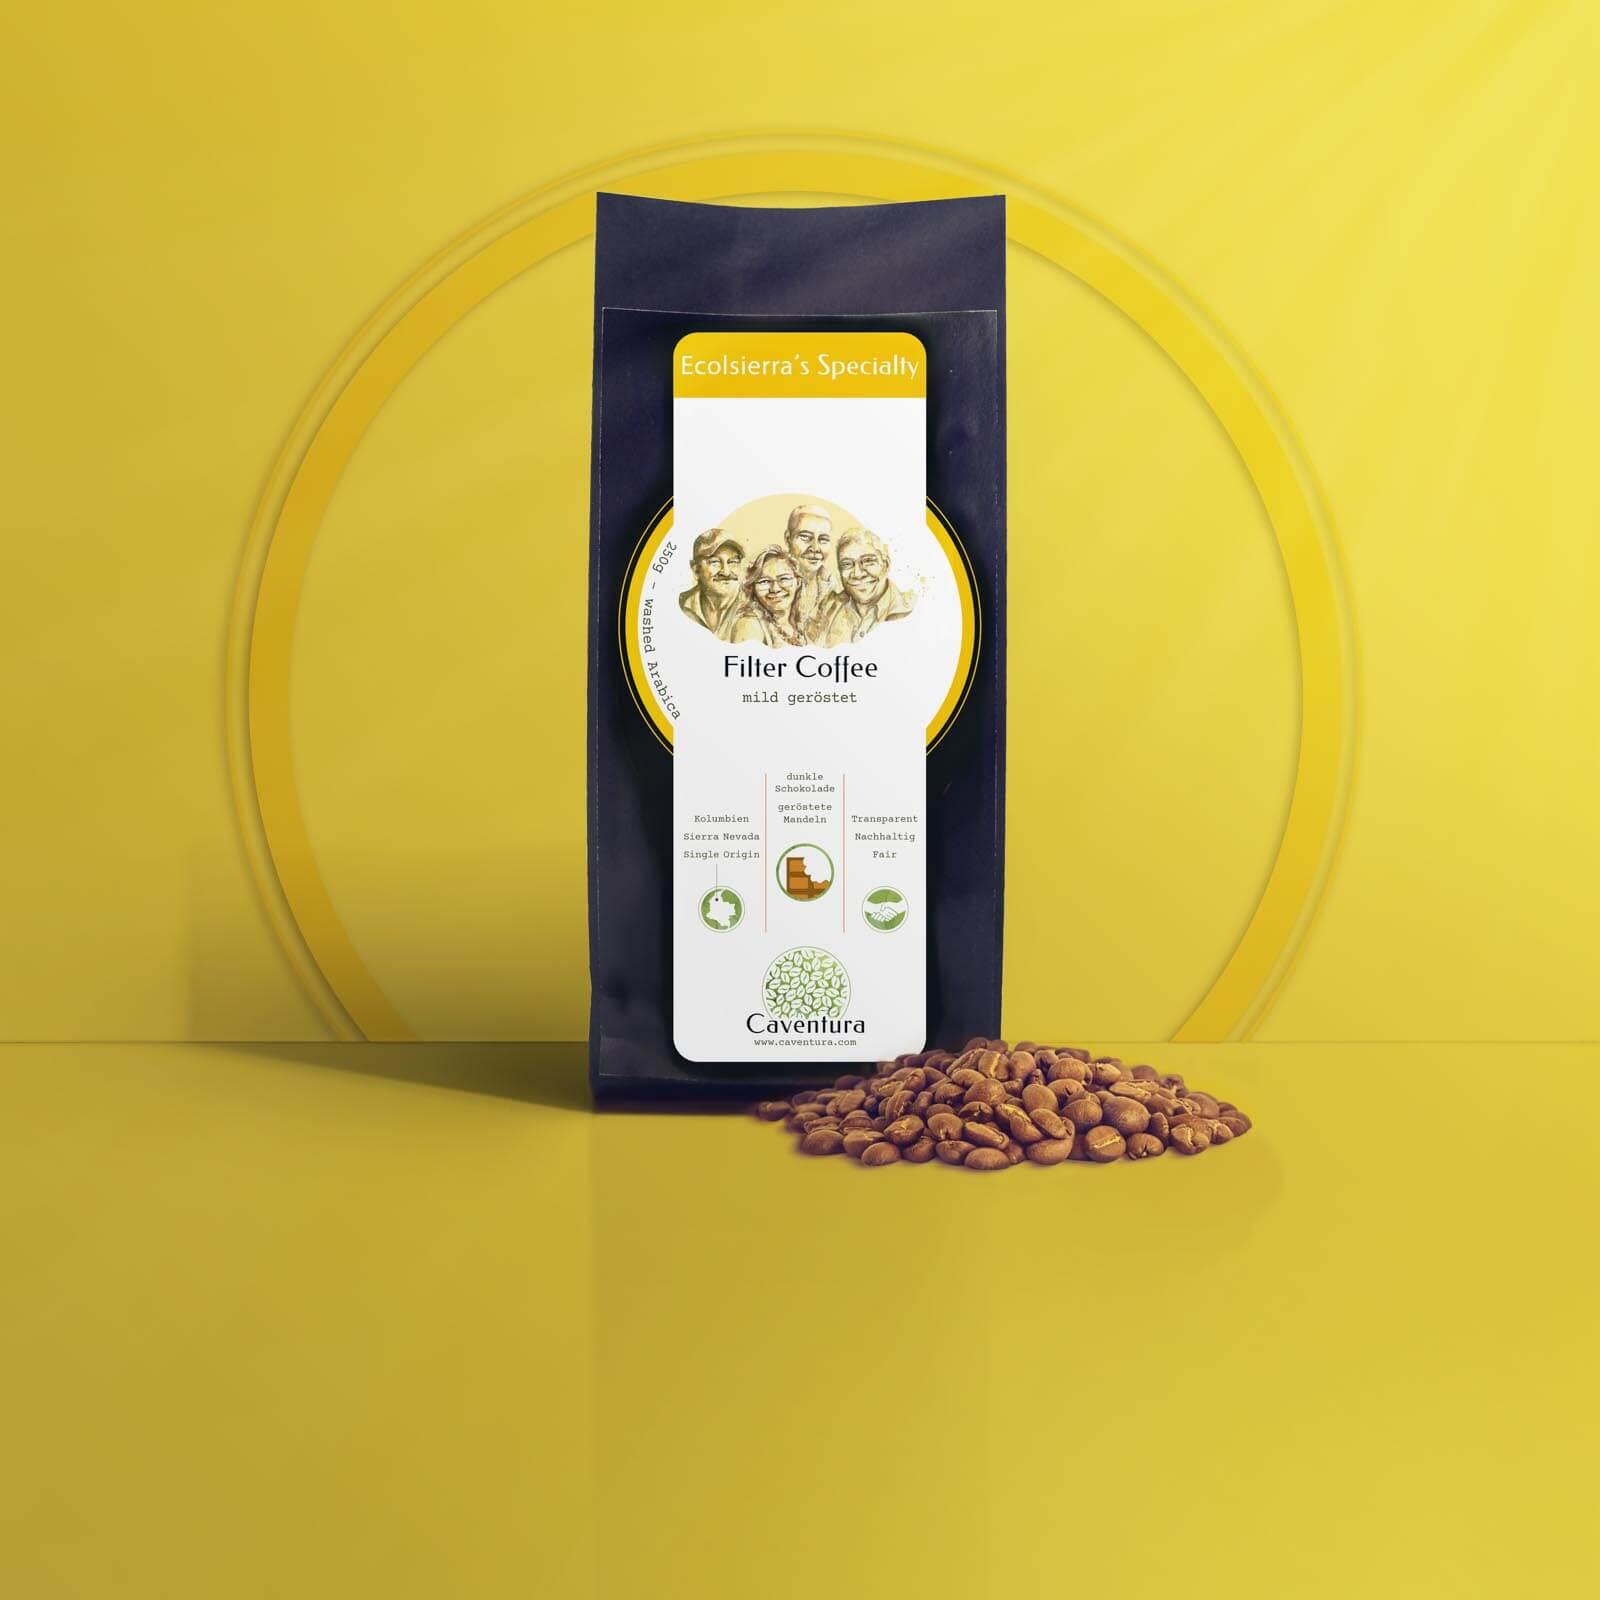 Ecolsierra's Specialty Filter Coffee